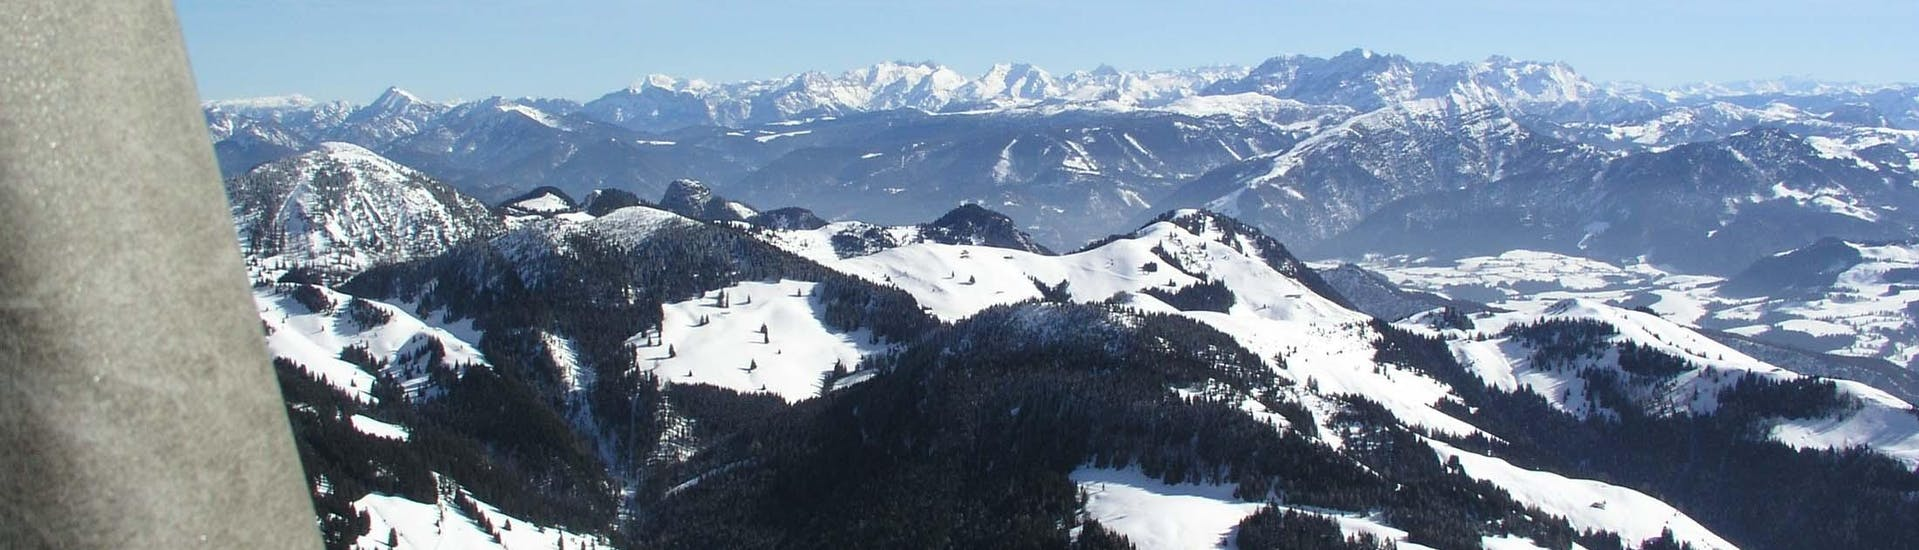 Alpine Balloon Ride in the Chiemgauer & Tyrolean Alps